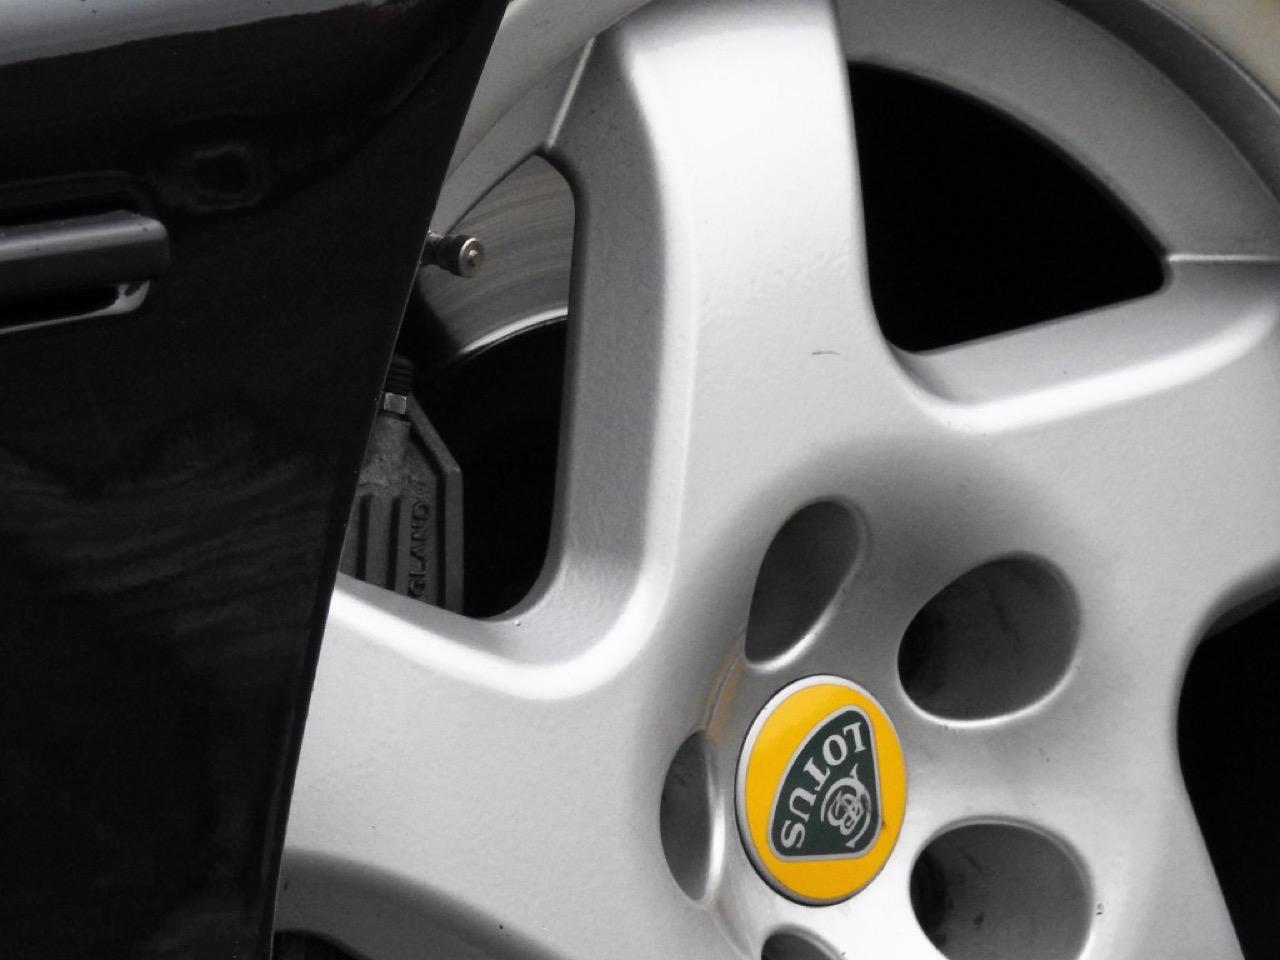 Opel Omega Lotus - Le monstre des 90's ! 49